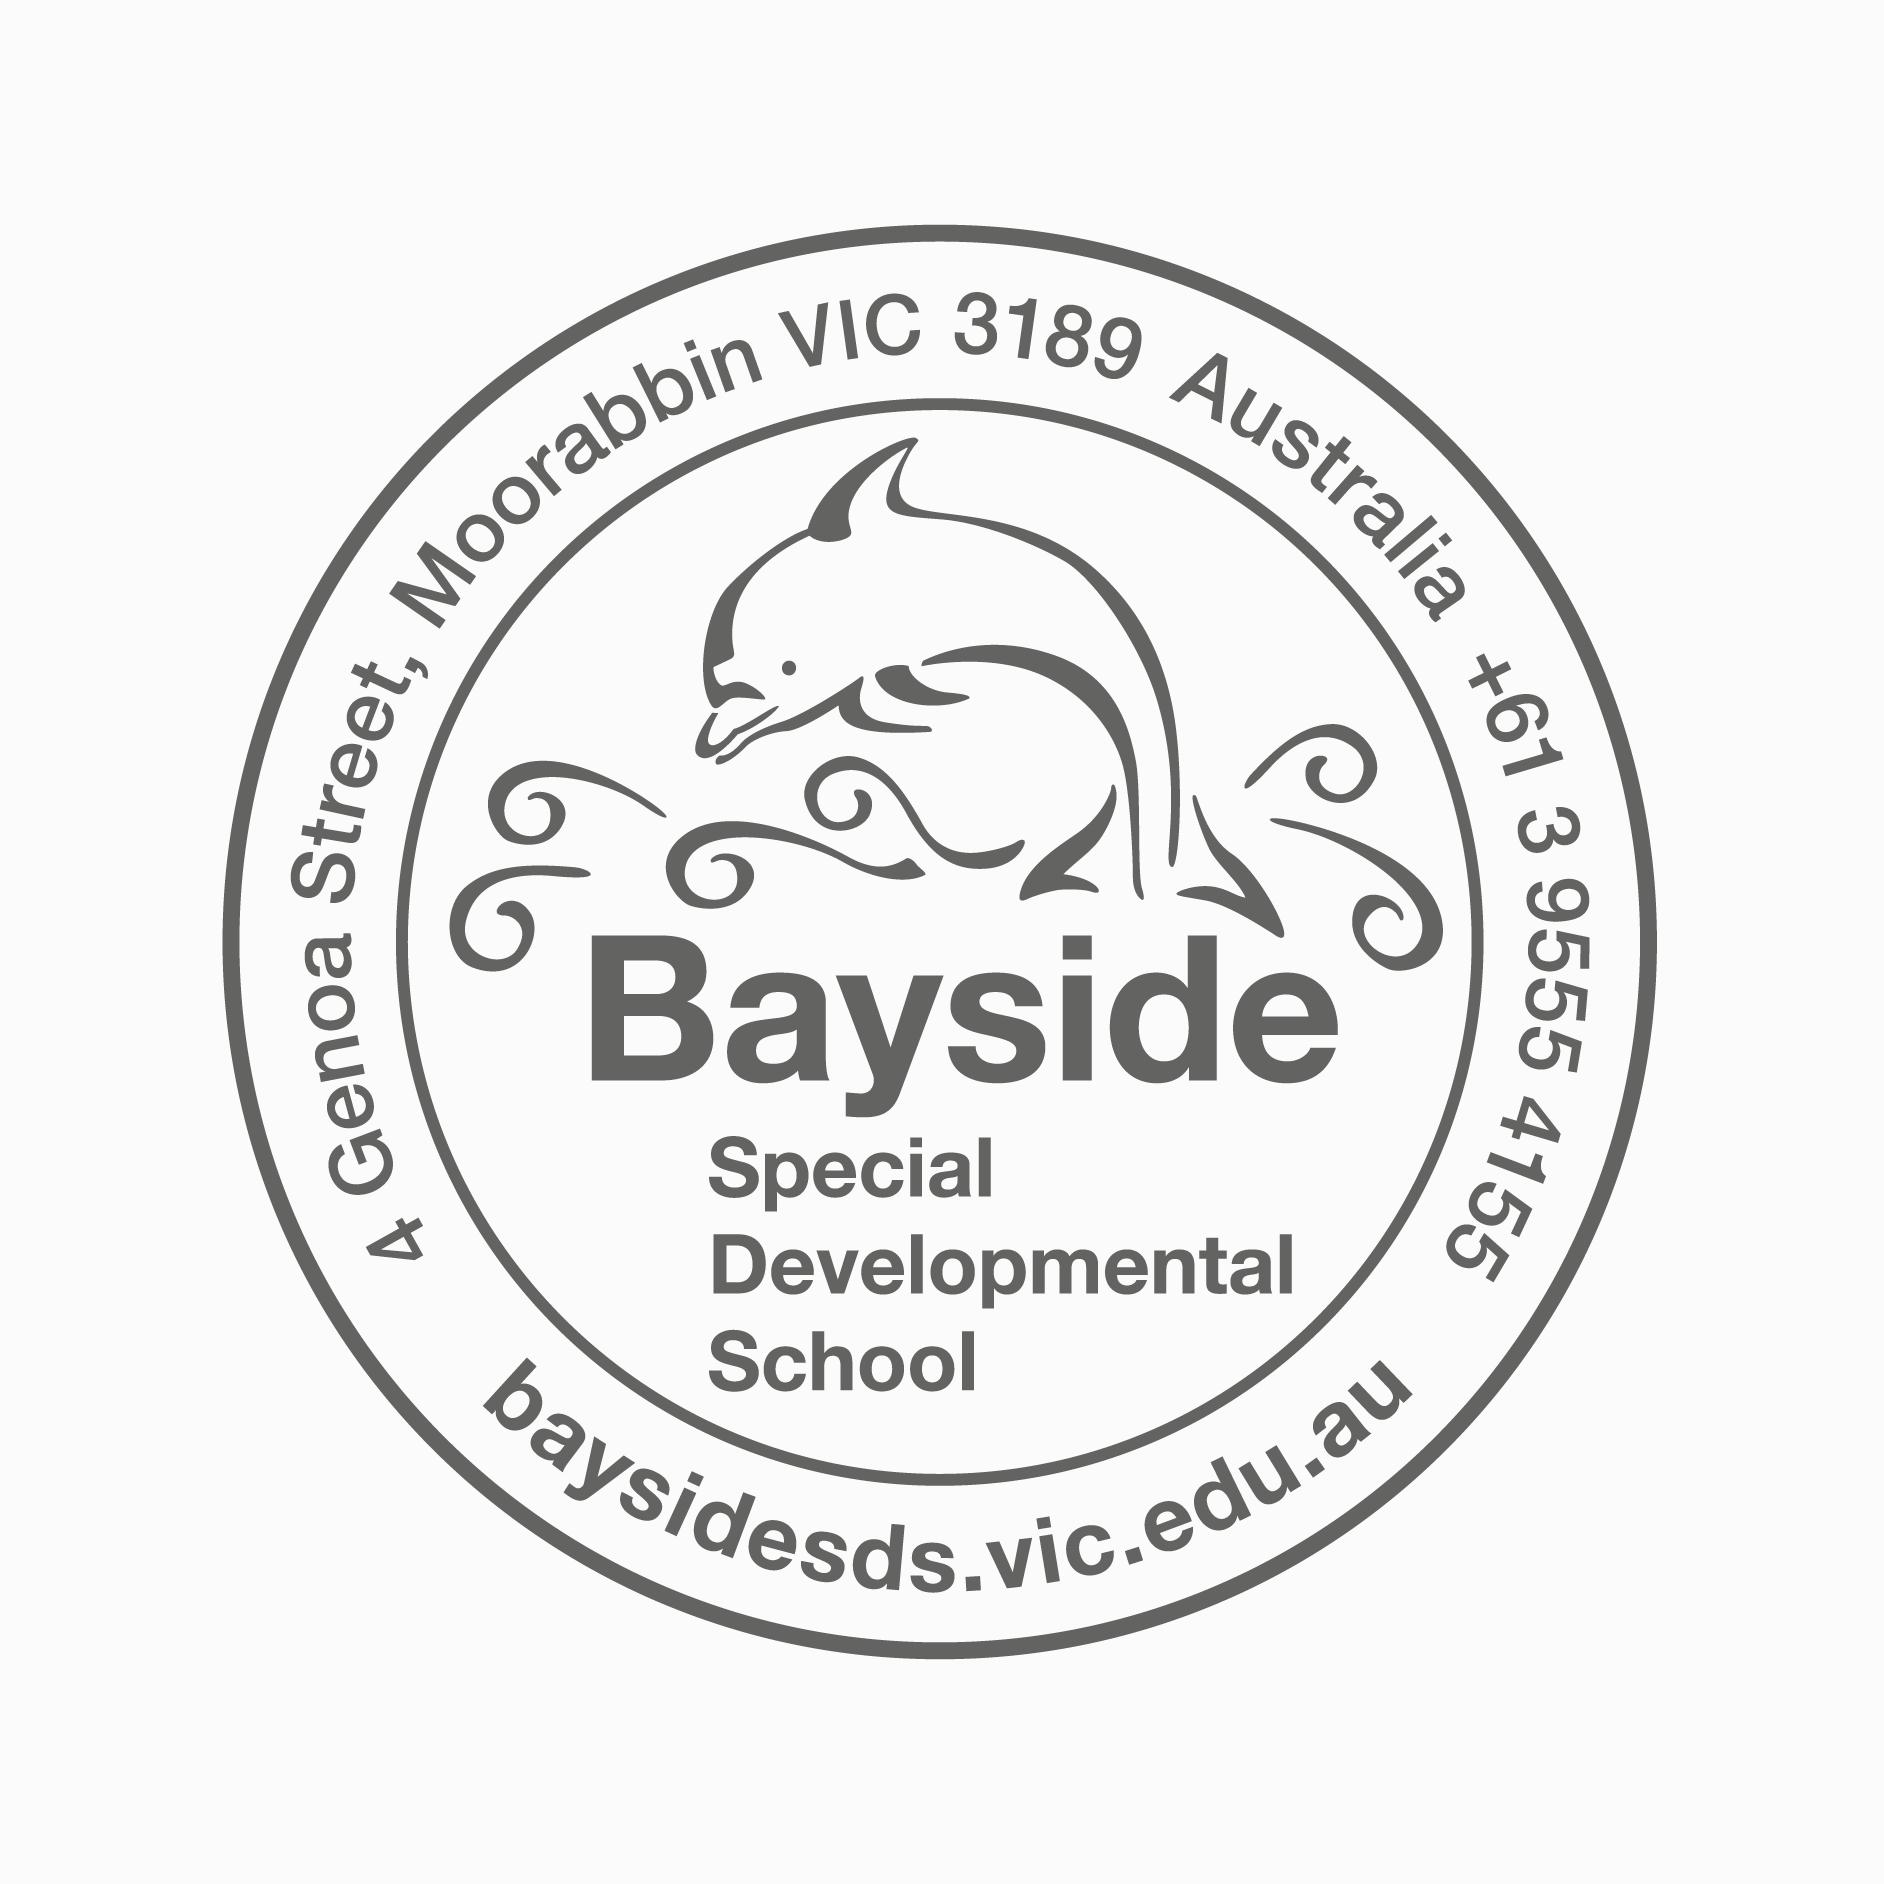 2733_07_bayside_seal_01.png